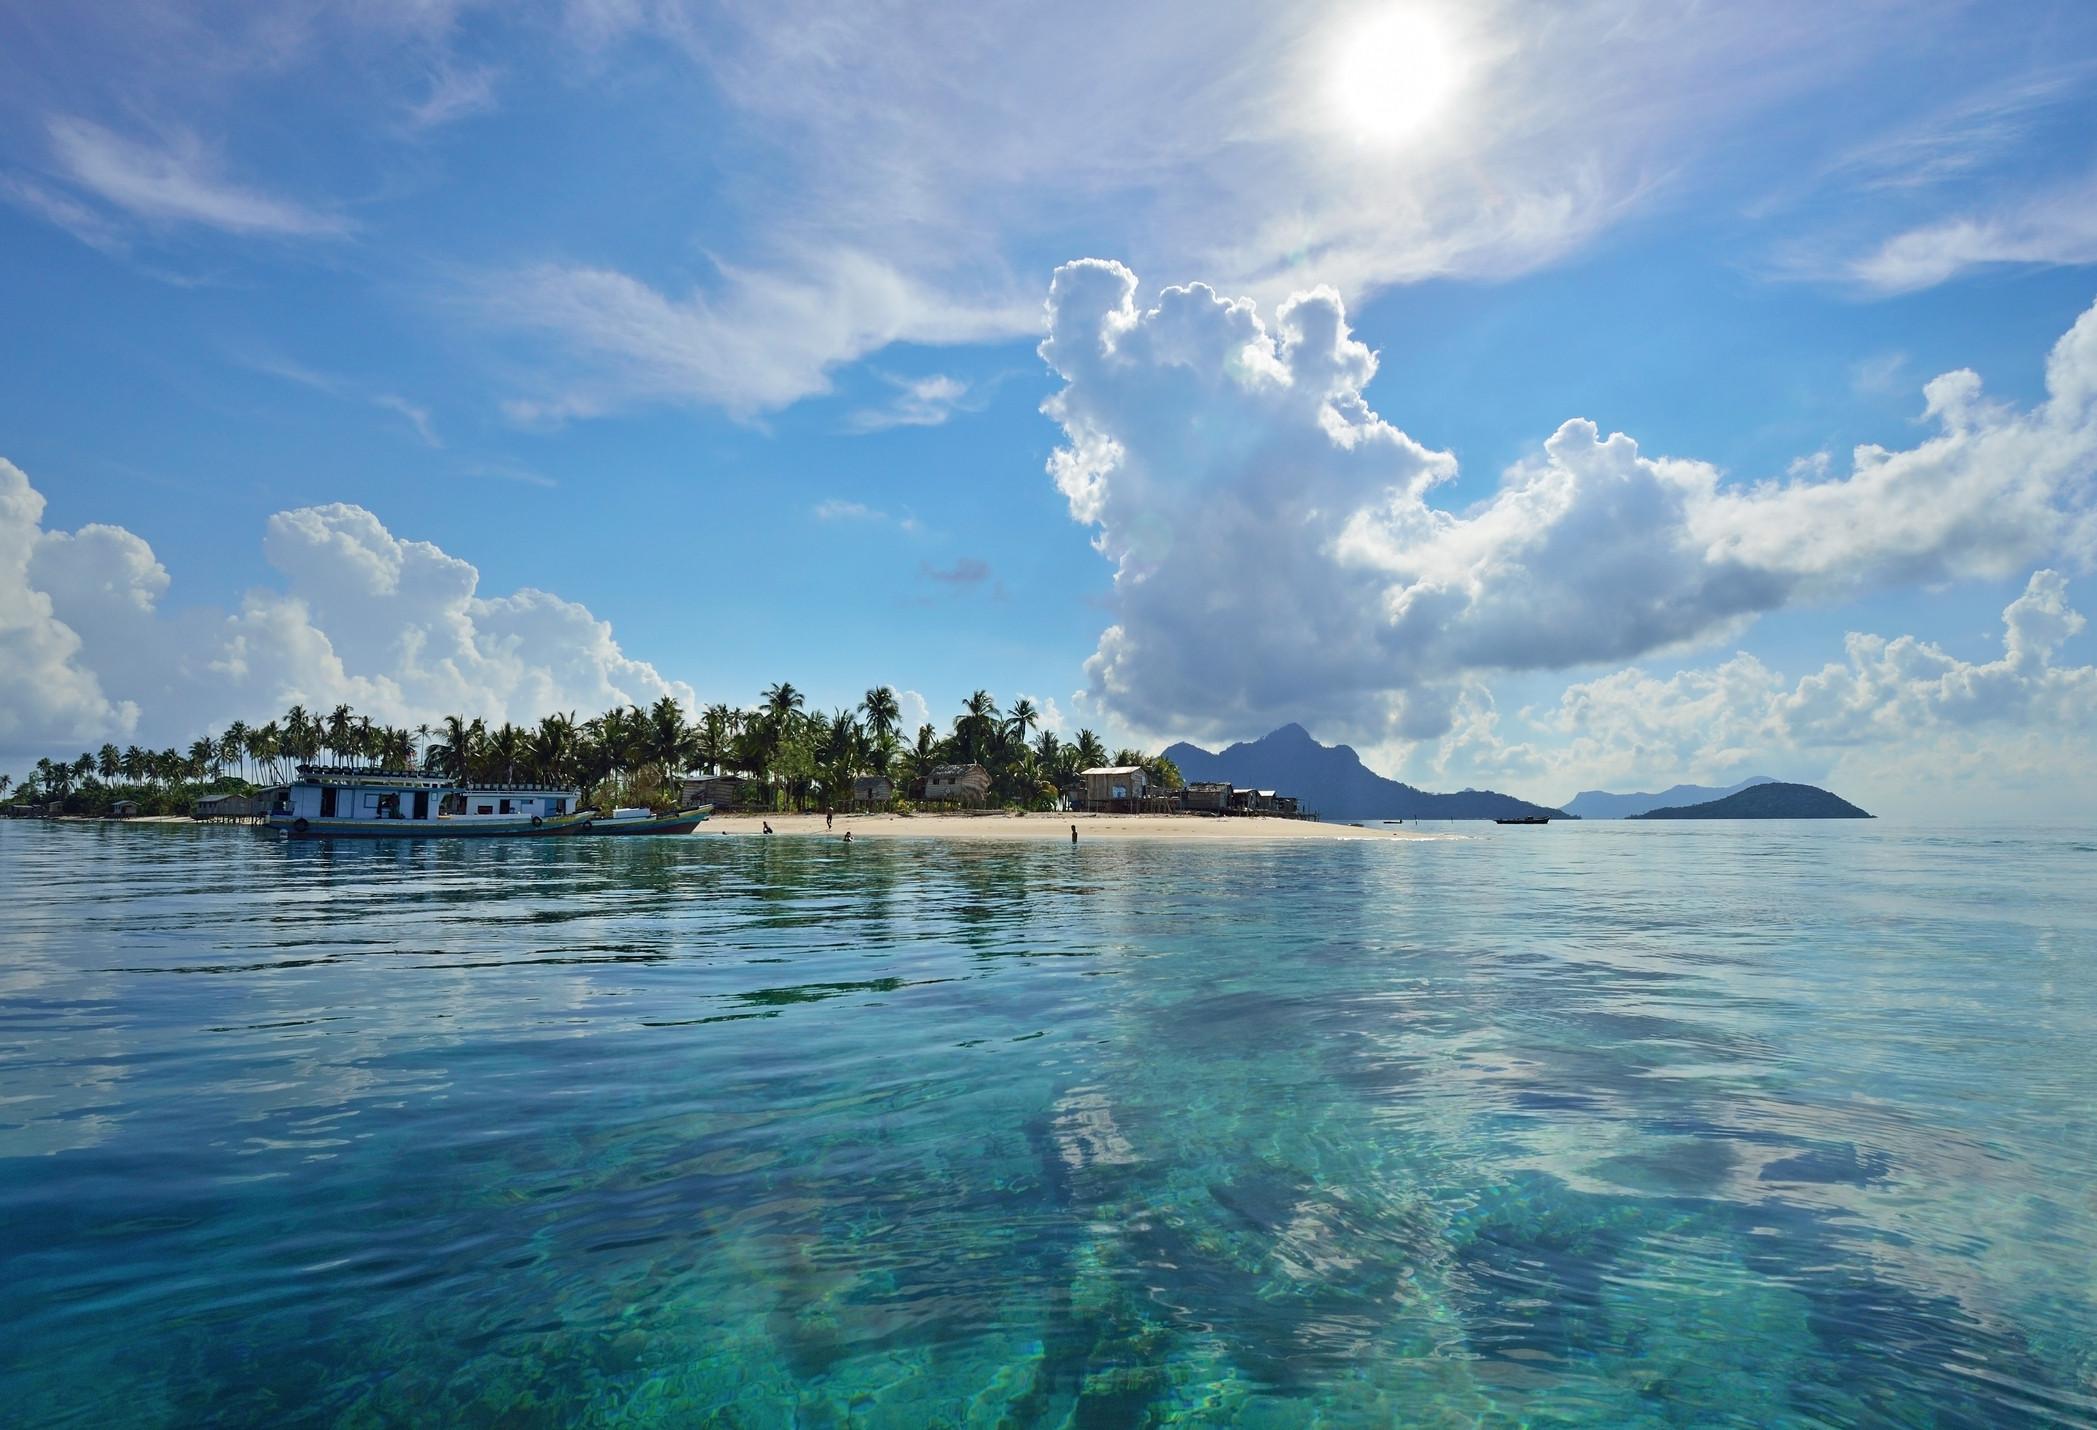 Autoridades levantam alerta de tsunami após terramoto na Indonésia